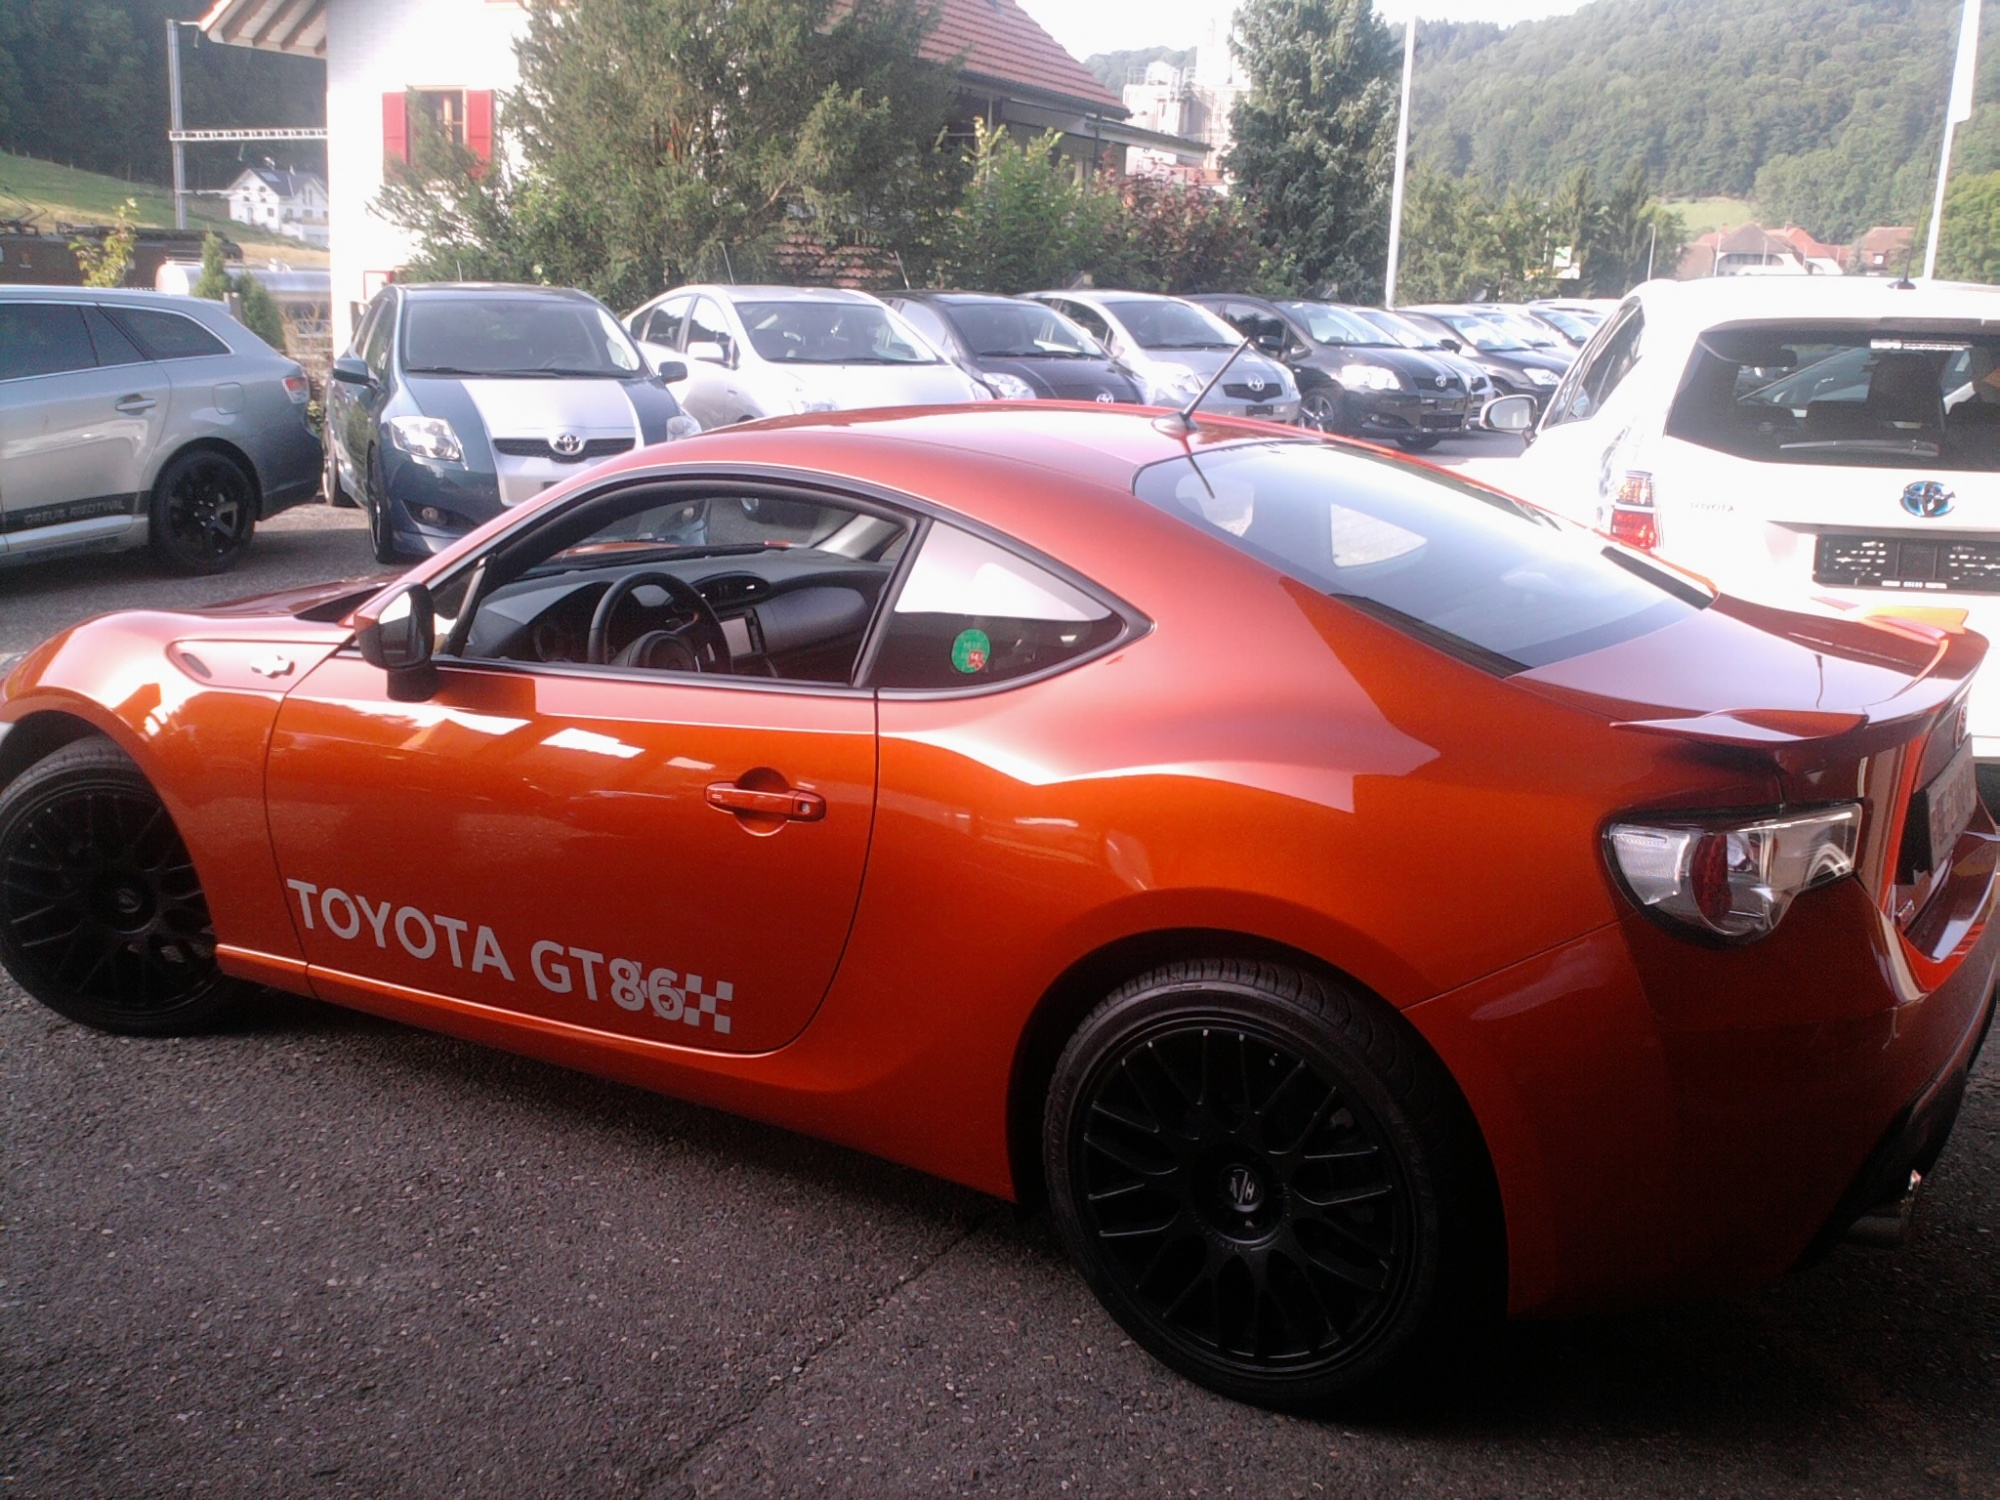 gt86 cars in switzerland - scion fr-s forum | subaru brz forum